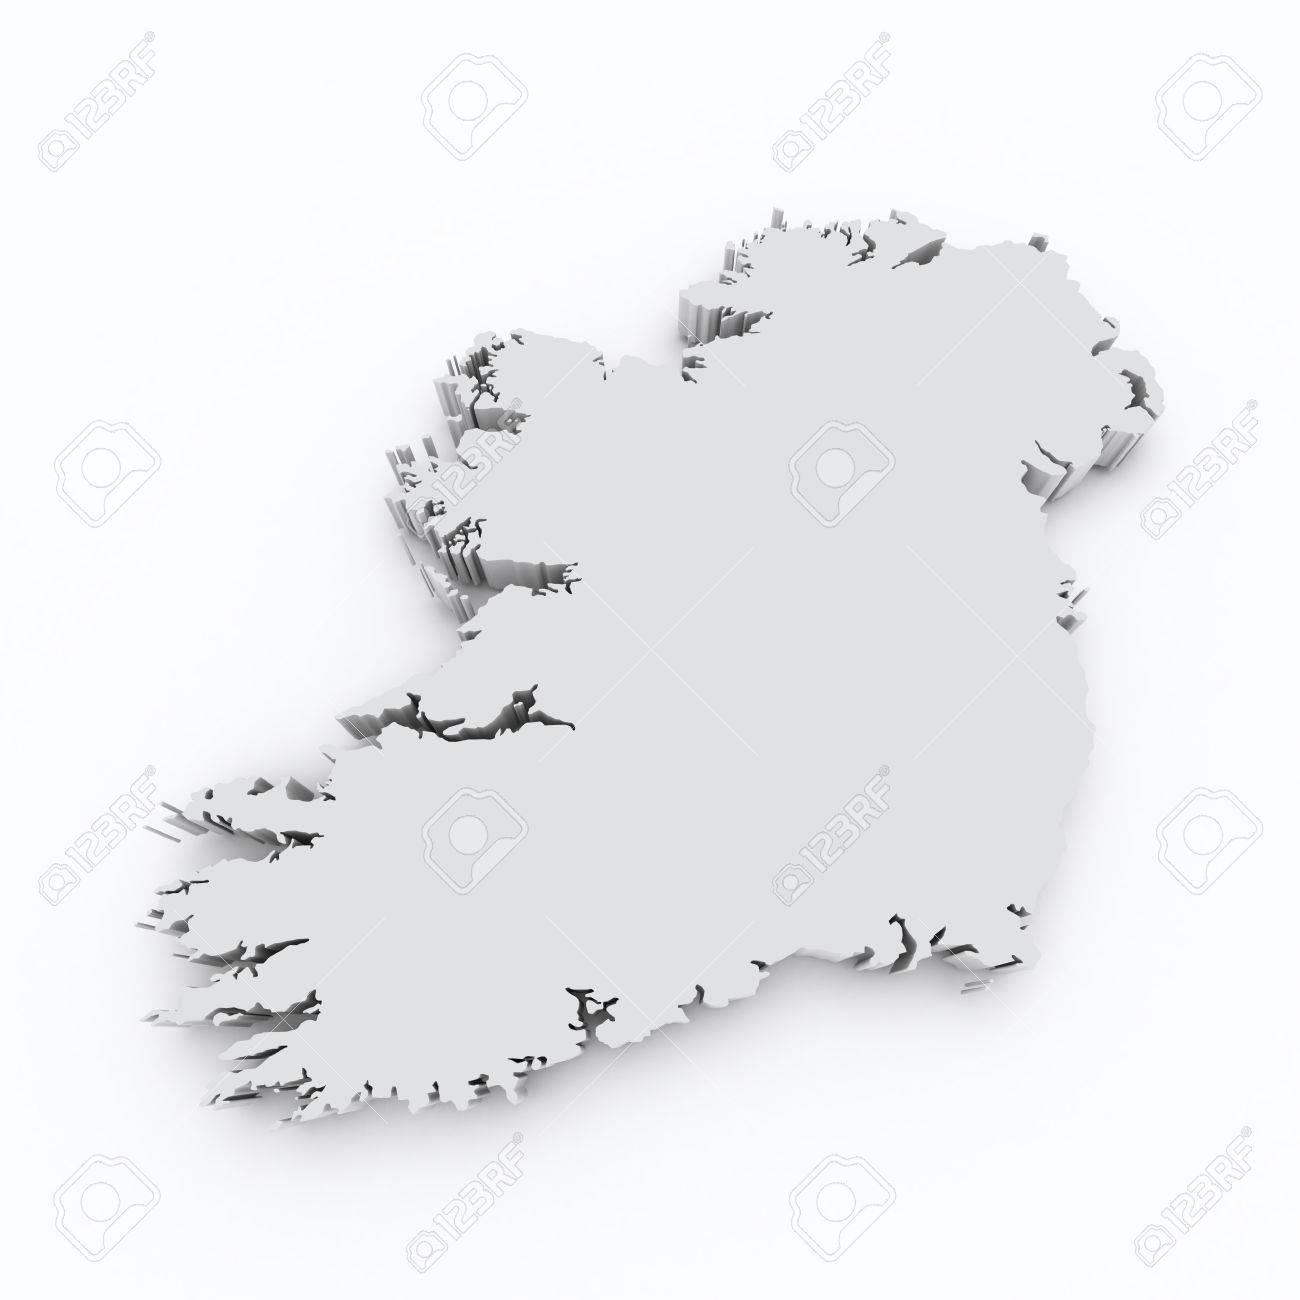 Map Of Ireland 3d.Ireland 3d Map